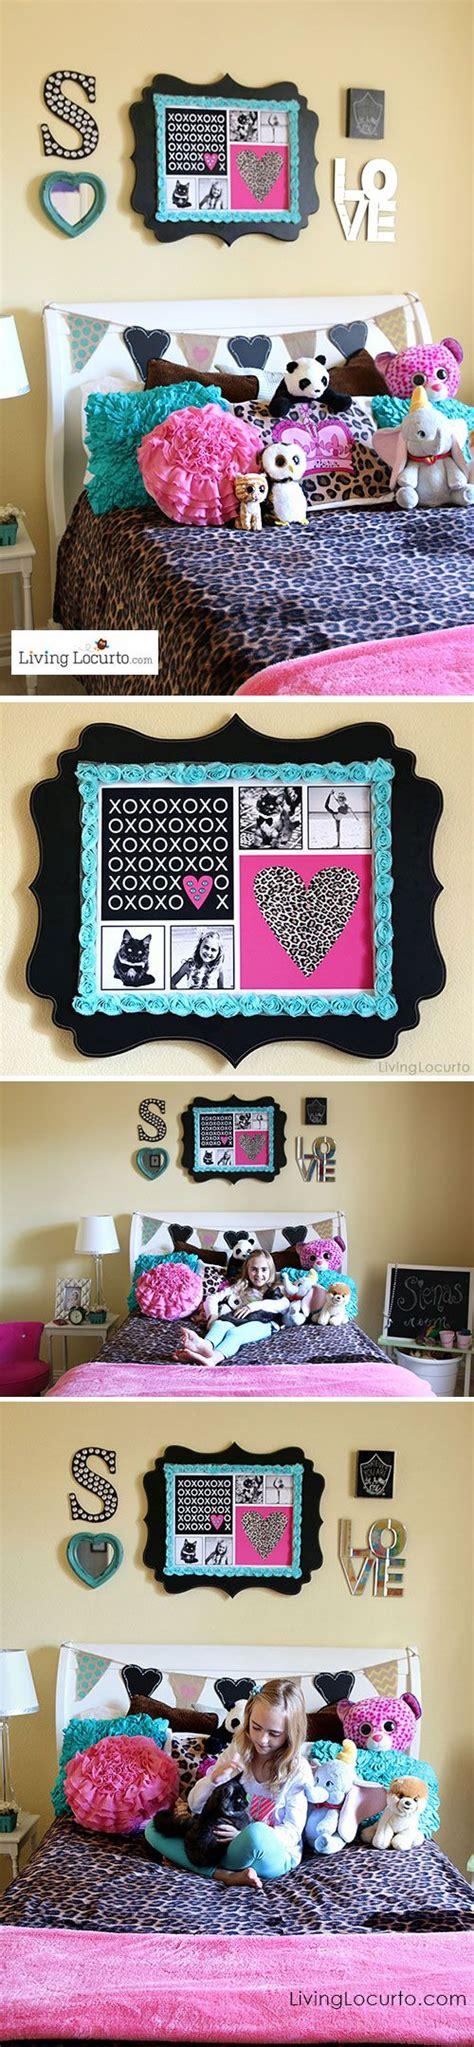 bedroom decorating crafts girls bedroom wall art ideas girl bedroom walls bedroom